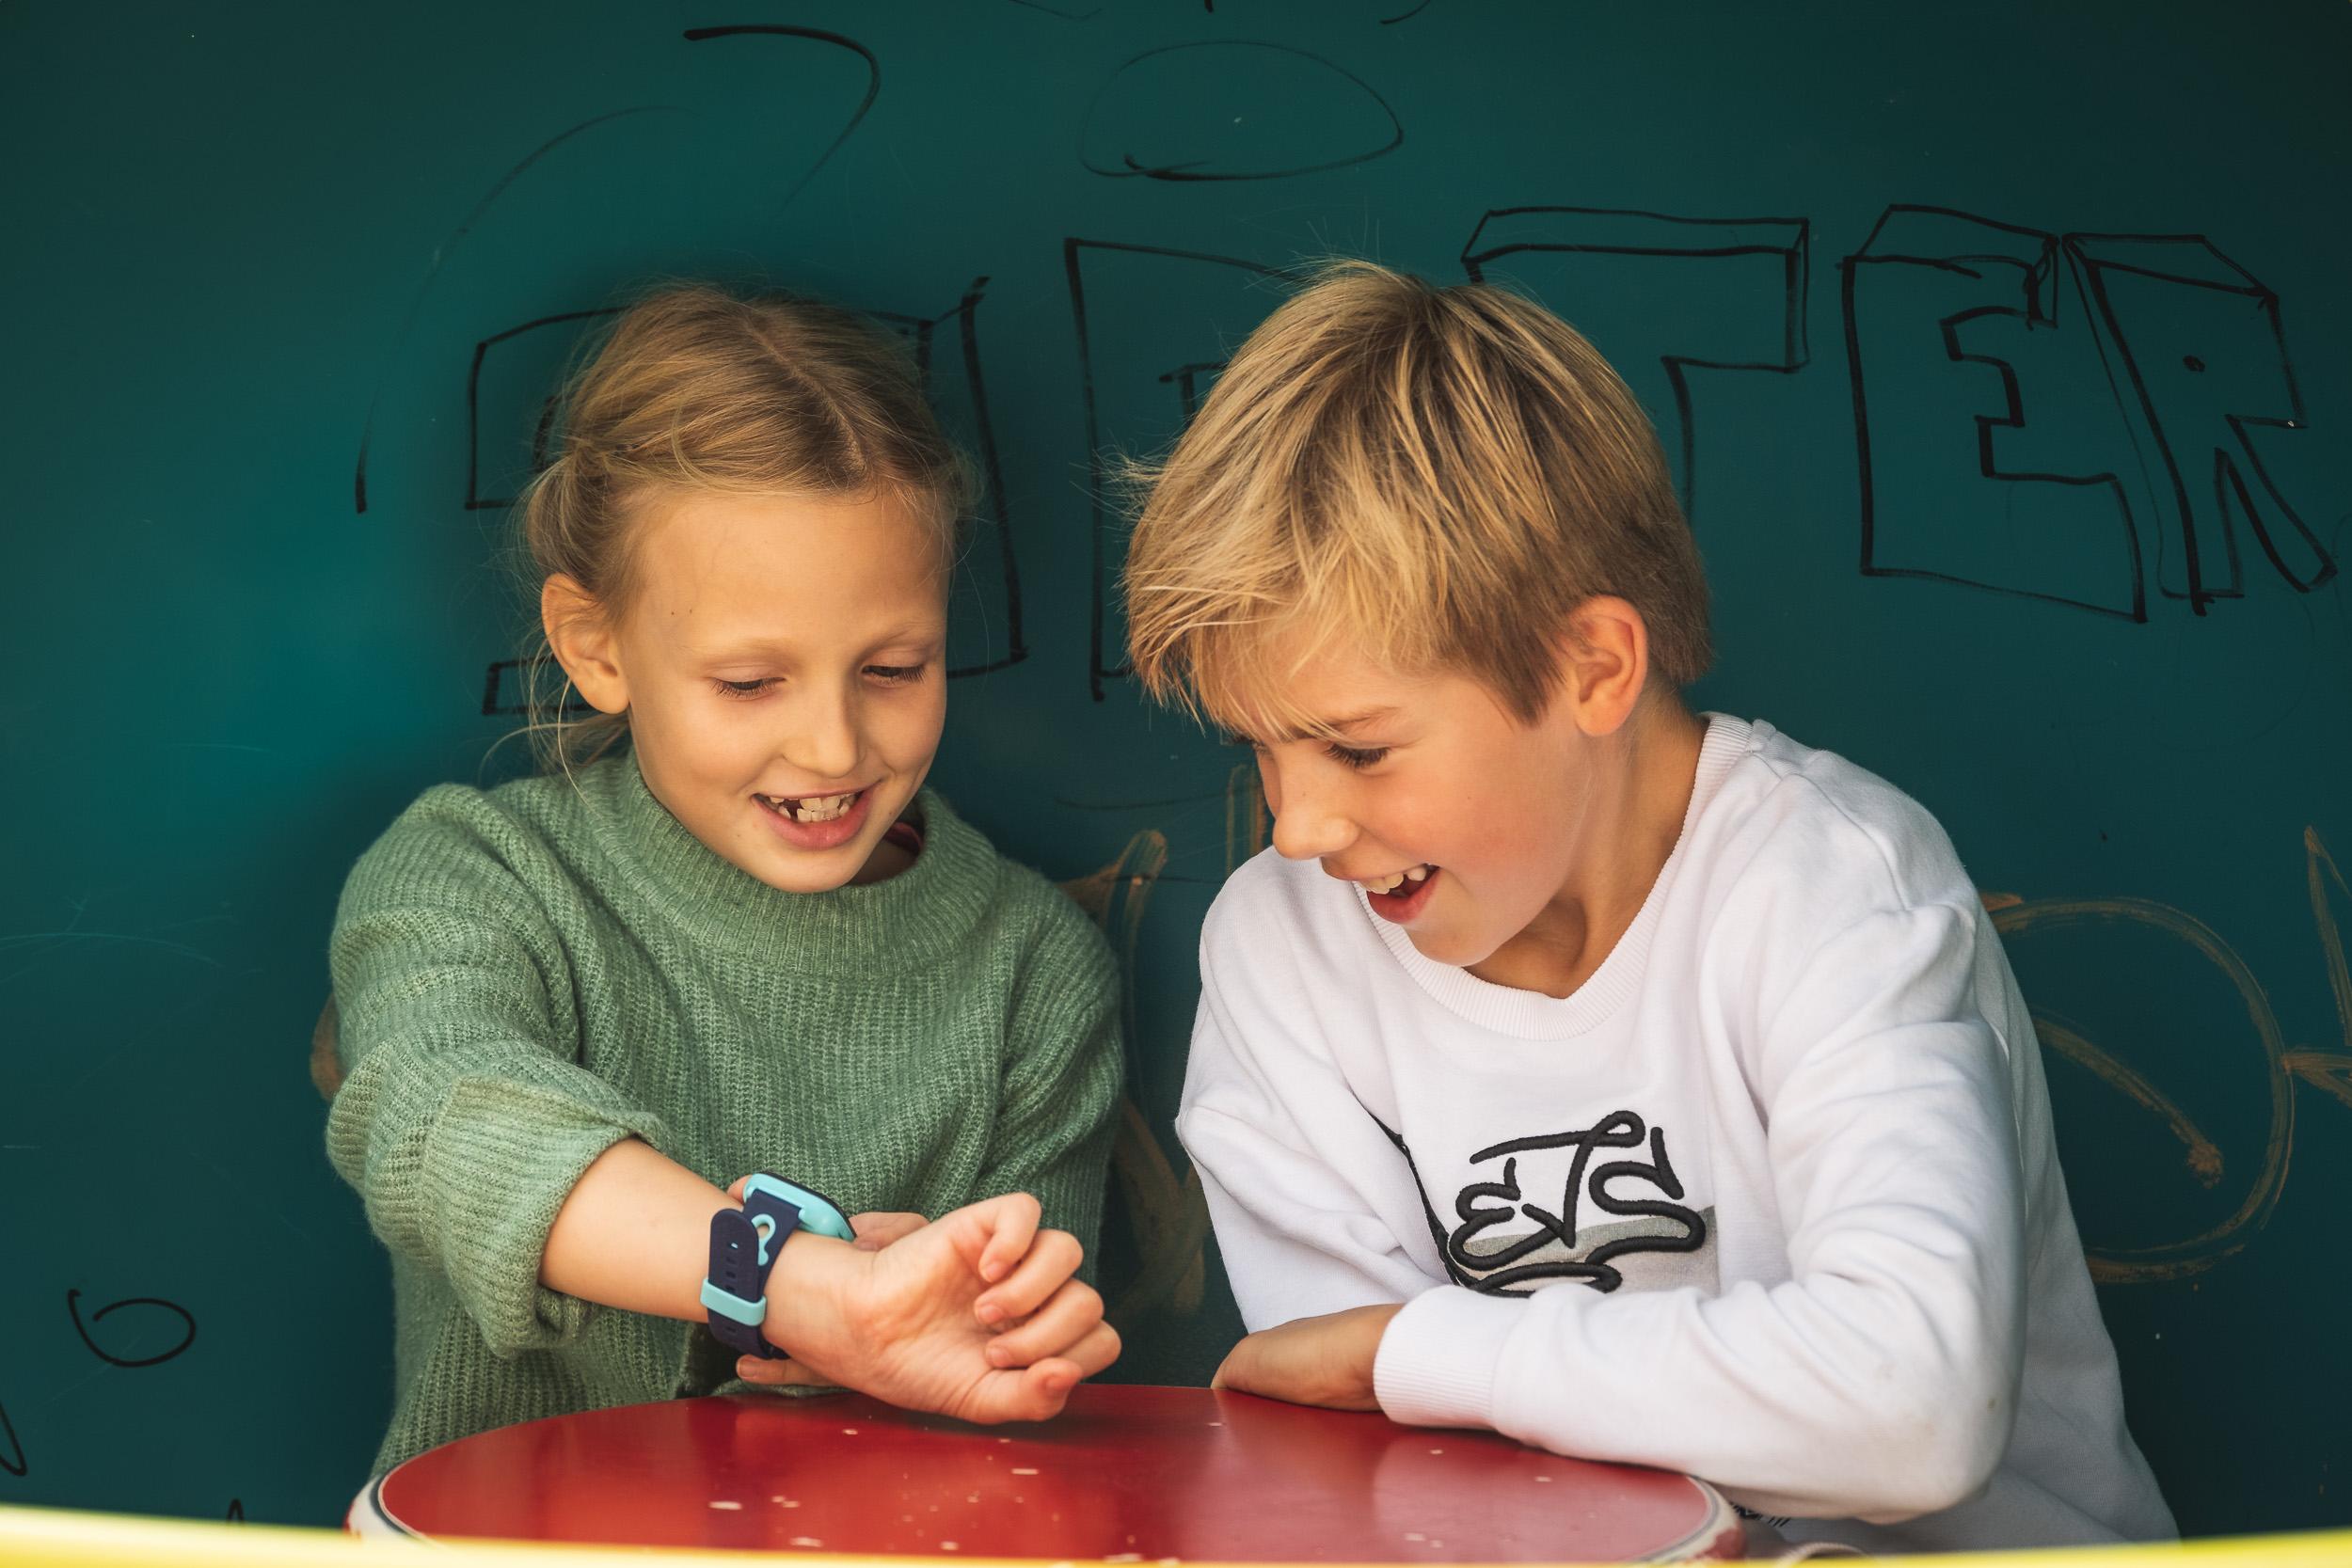 To barn som ser på en XPLORA smartklokke